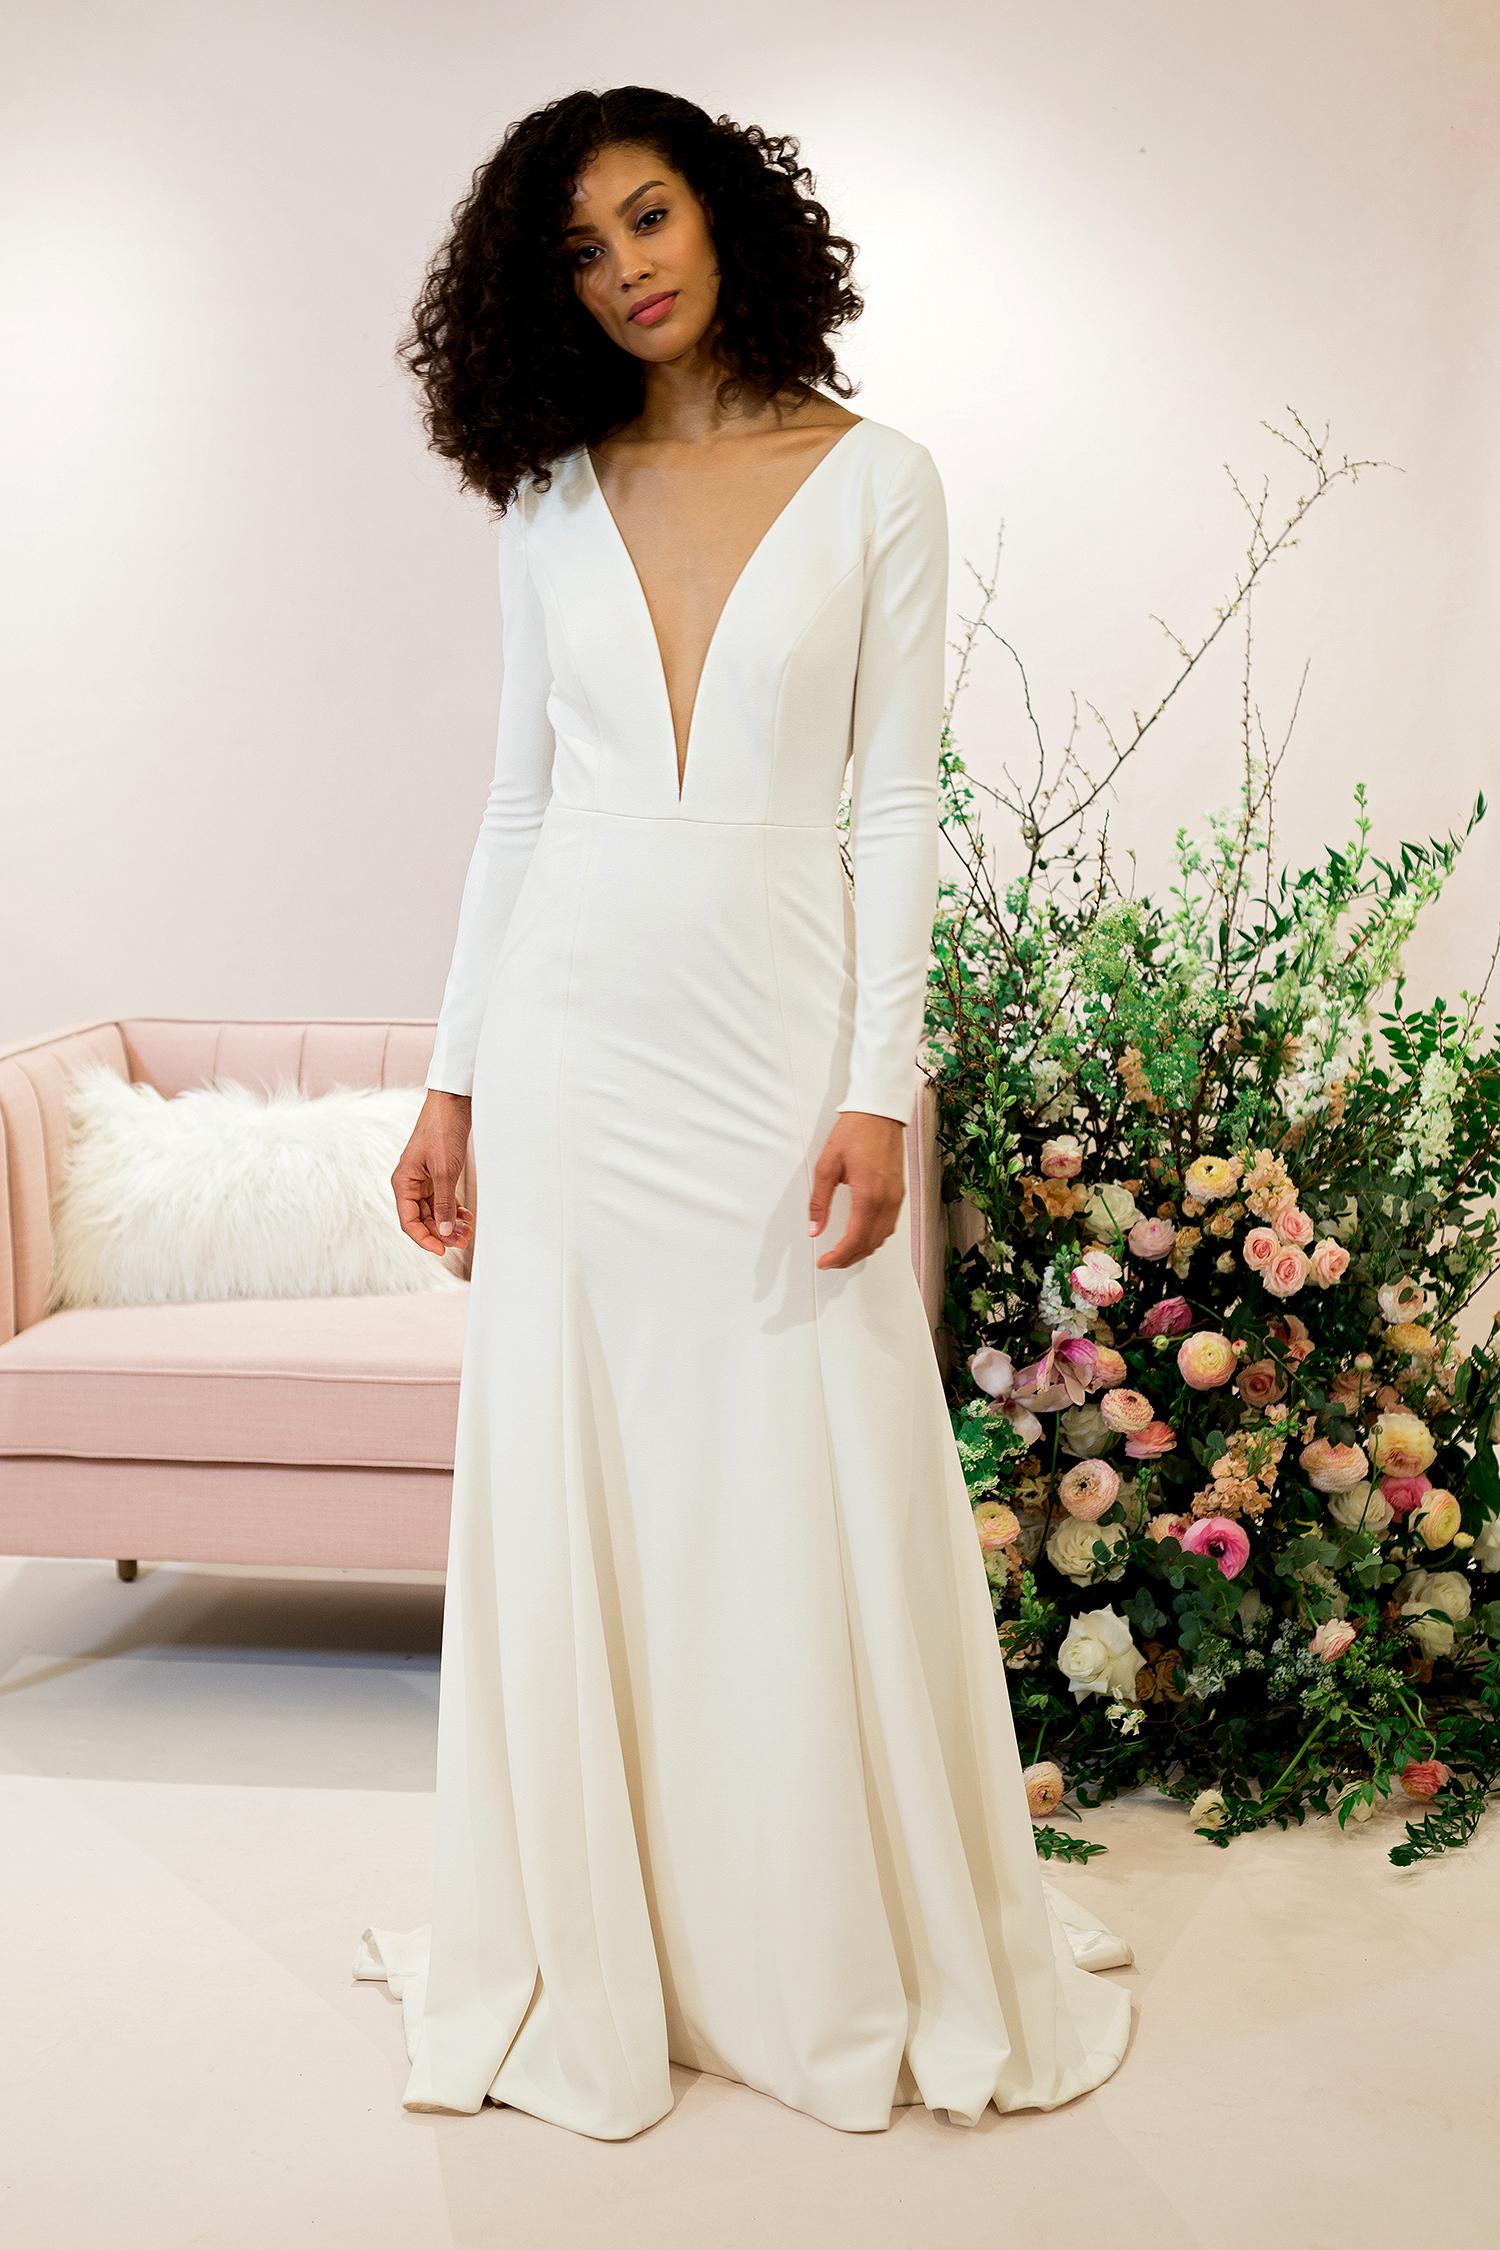 jenny by jenny yoo dress spring 2019 long-sleeved minimalist sheath